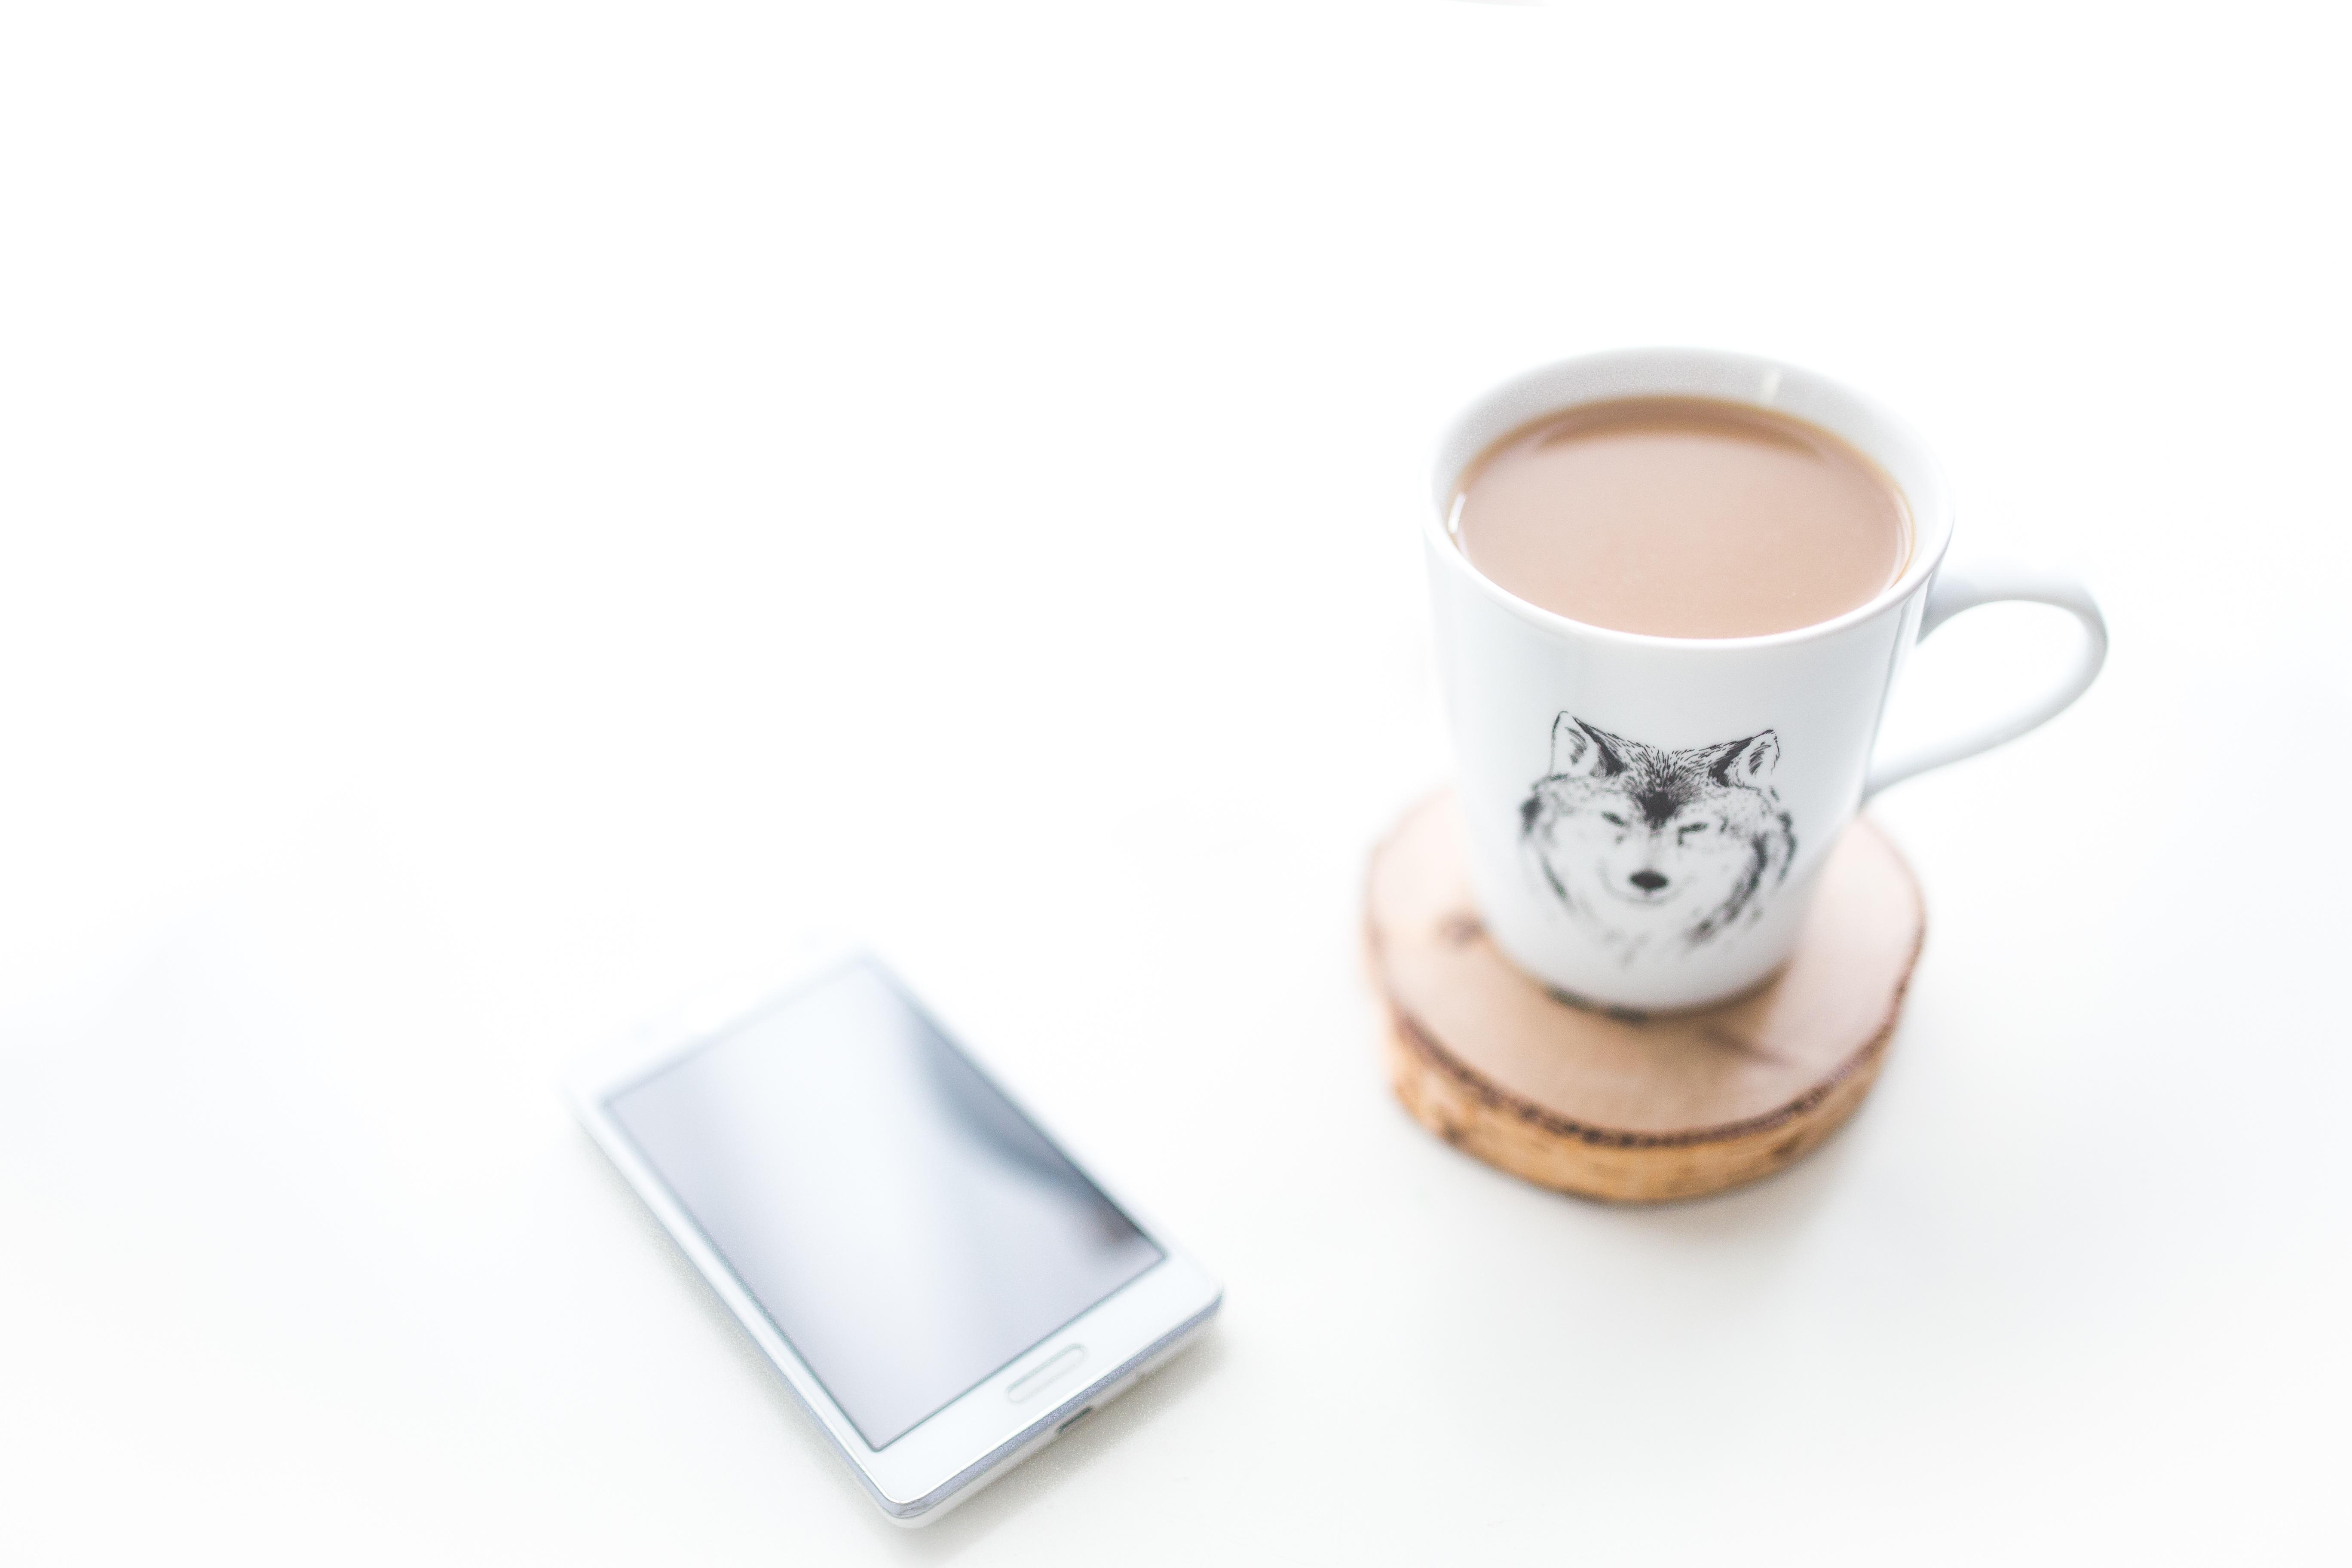 Kostenlose foto : Smartphone, Mobile, Hand, Kaffee, Technologie ...